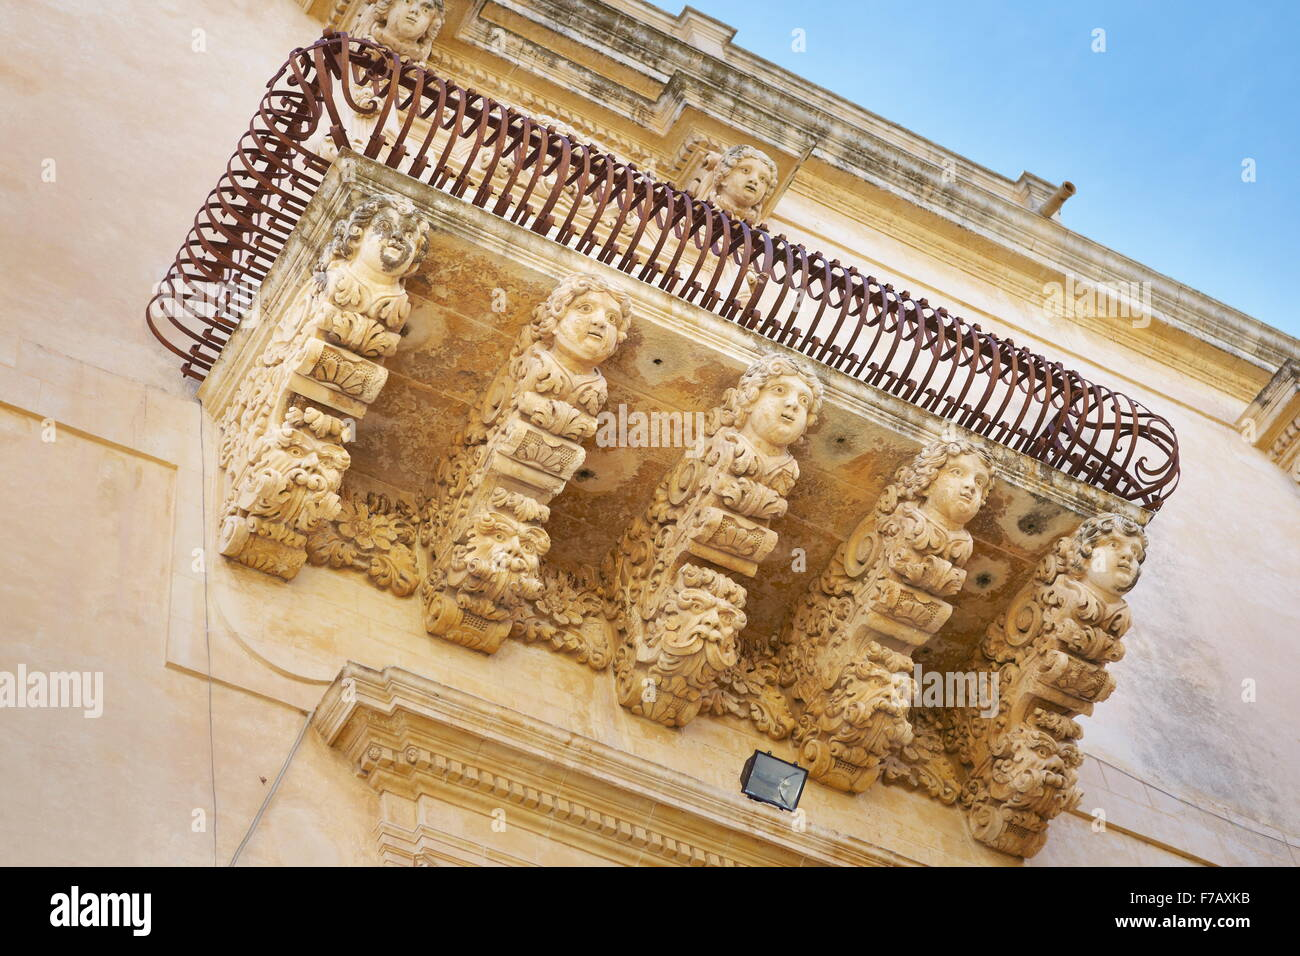 Barocke Details der Balkon im Palazzo Villadorata (Palazzo Nicolaci), alte Stadt Noto, Sizilien, Italien-UNESCO Stockbild